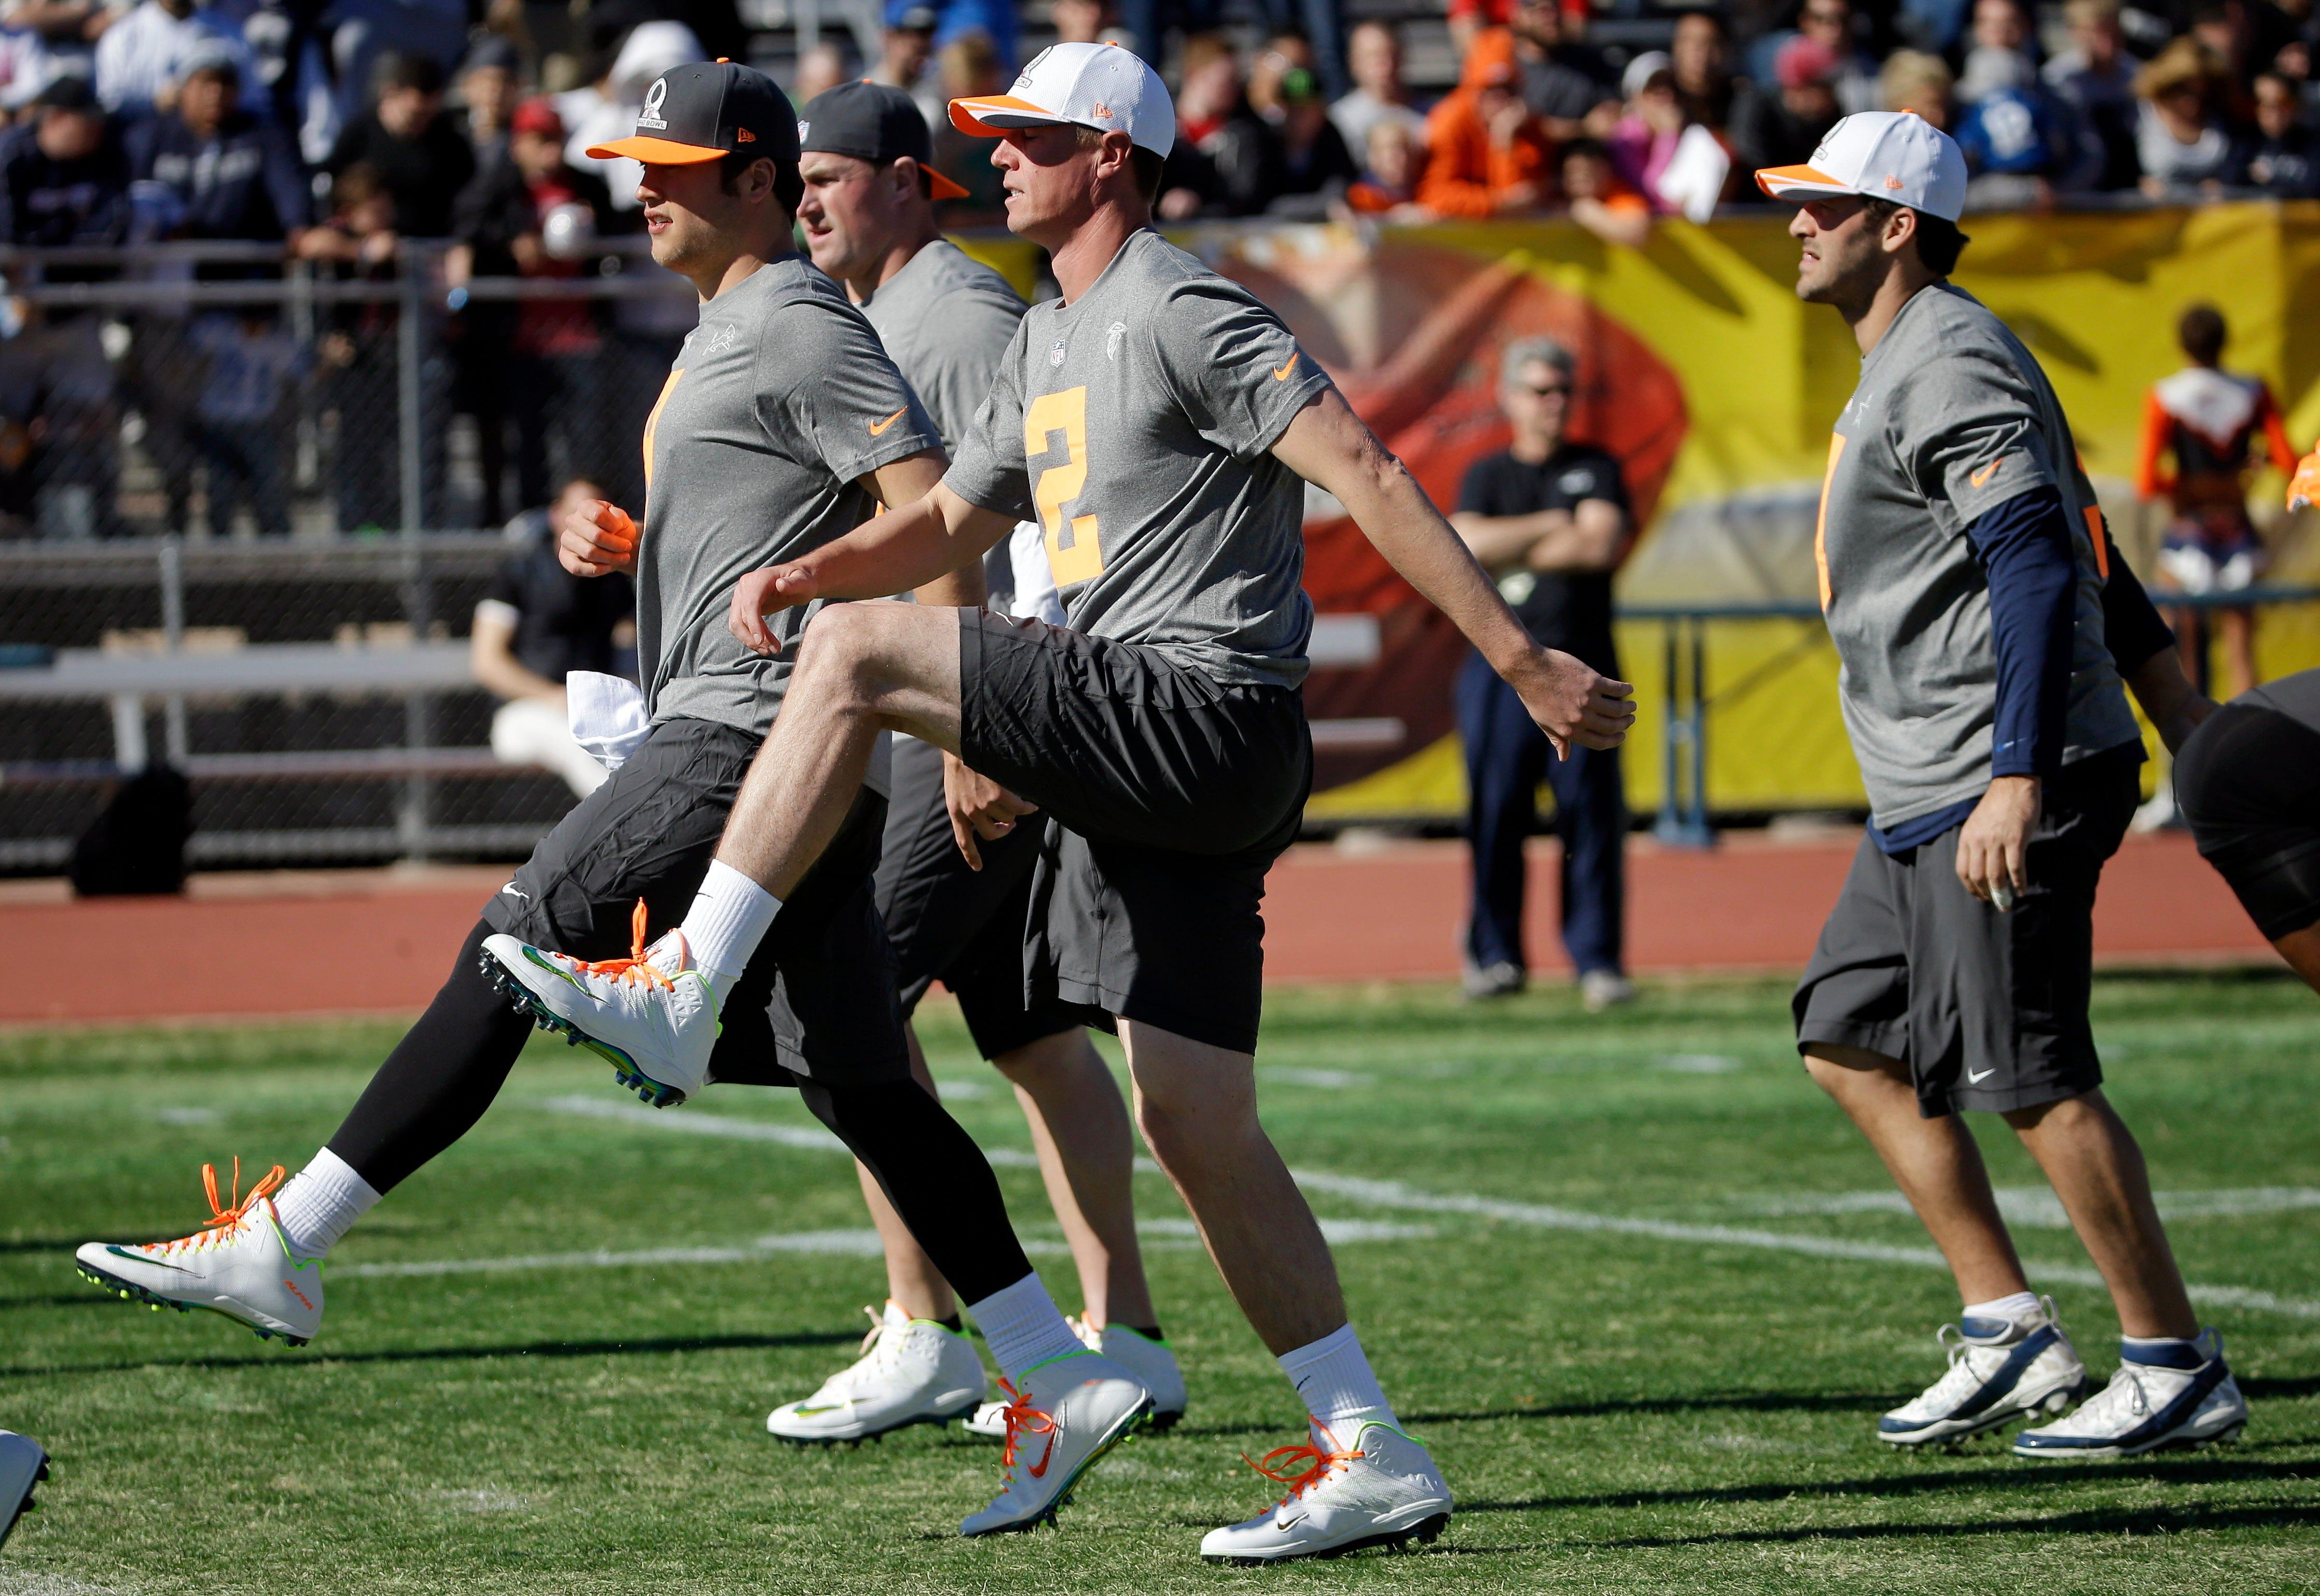 How Detroit Lions' Matthew Stafford and Atlanta Falcons' Matt Ryan became close friends